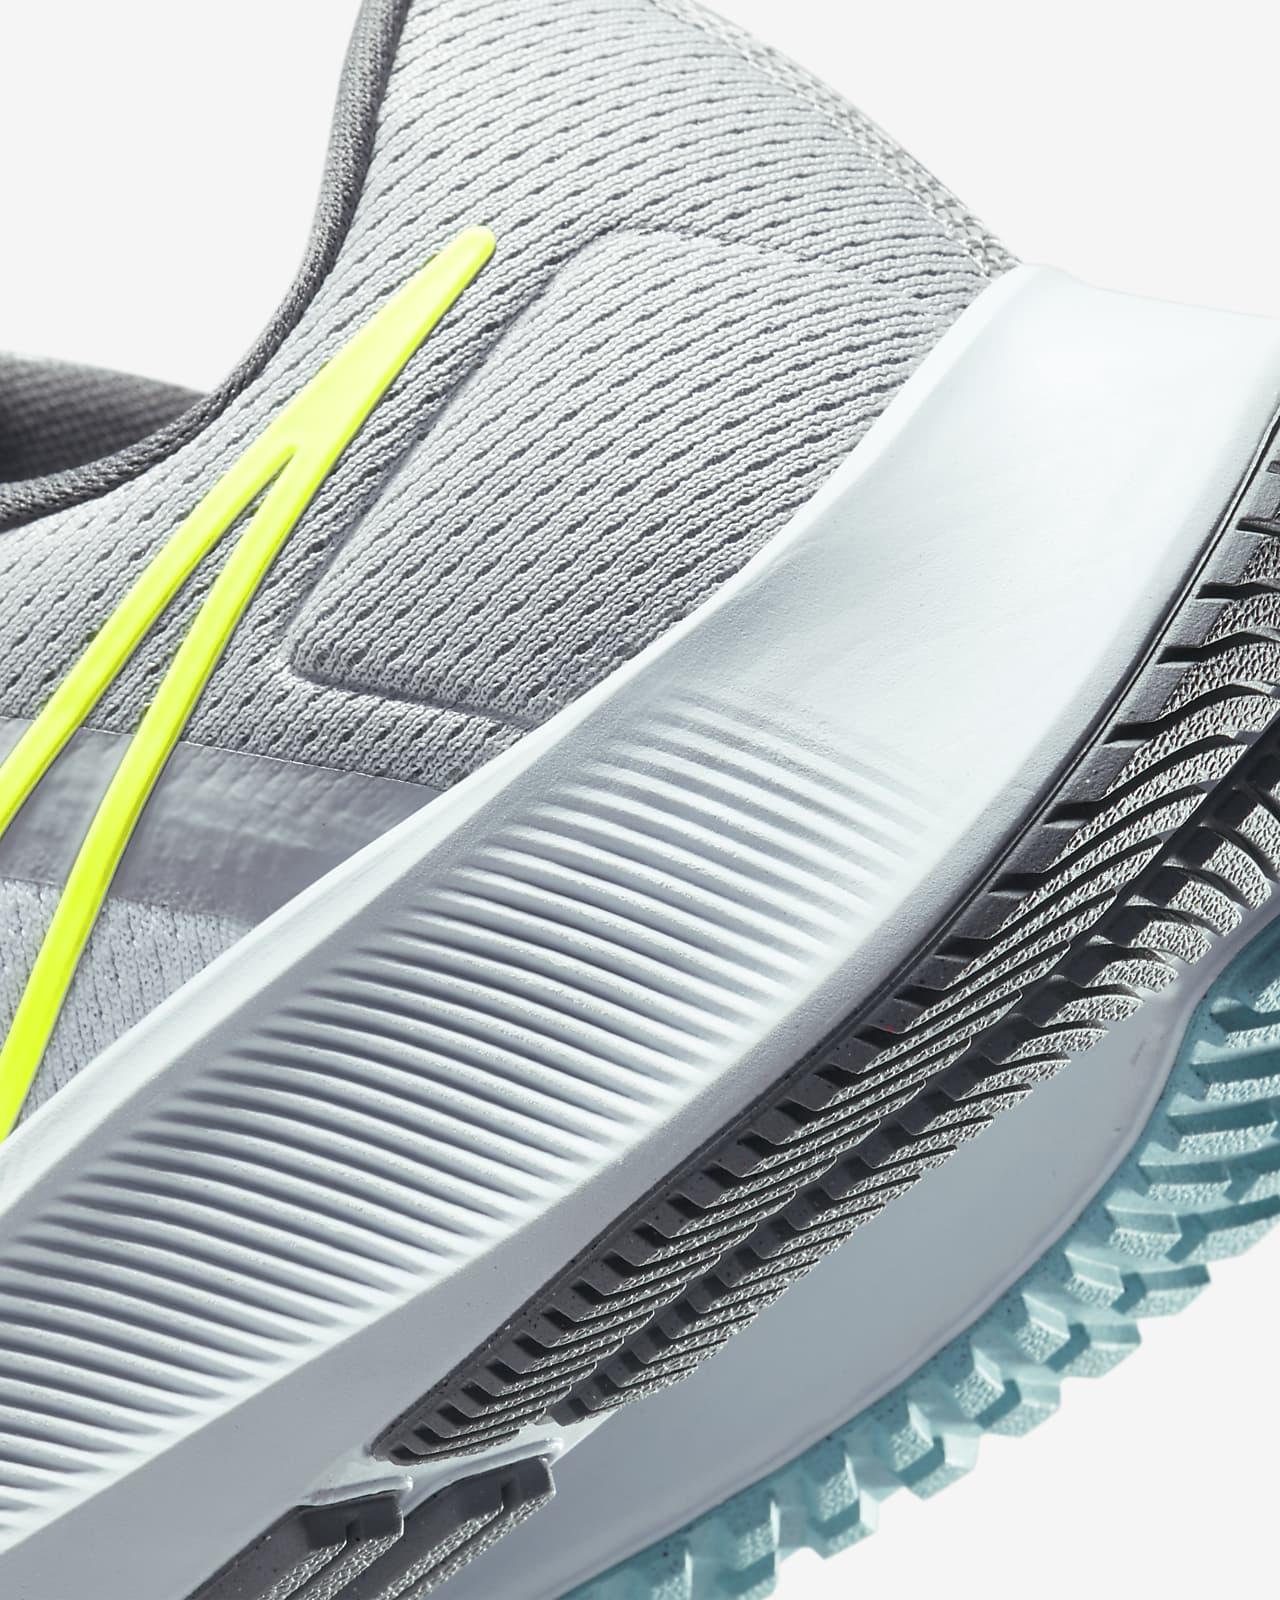 Nike Air Zoom Pegasus 38 Limited Edition Men's Running Shoes. Nike LU